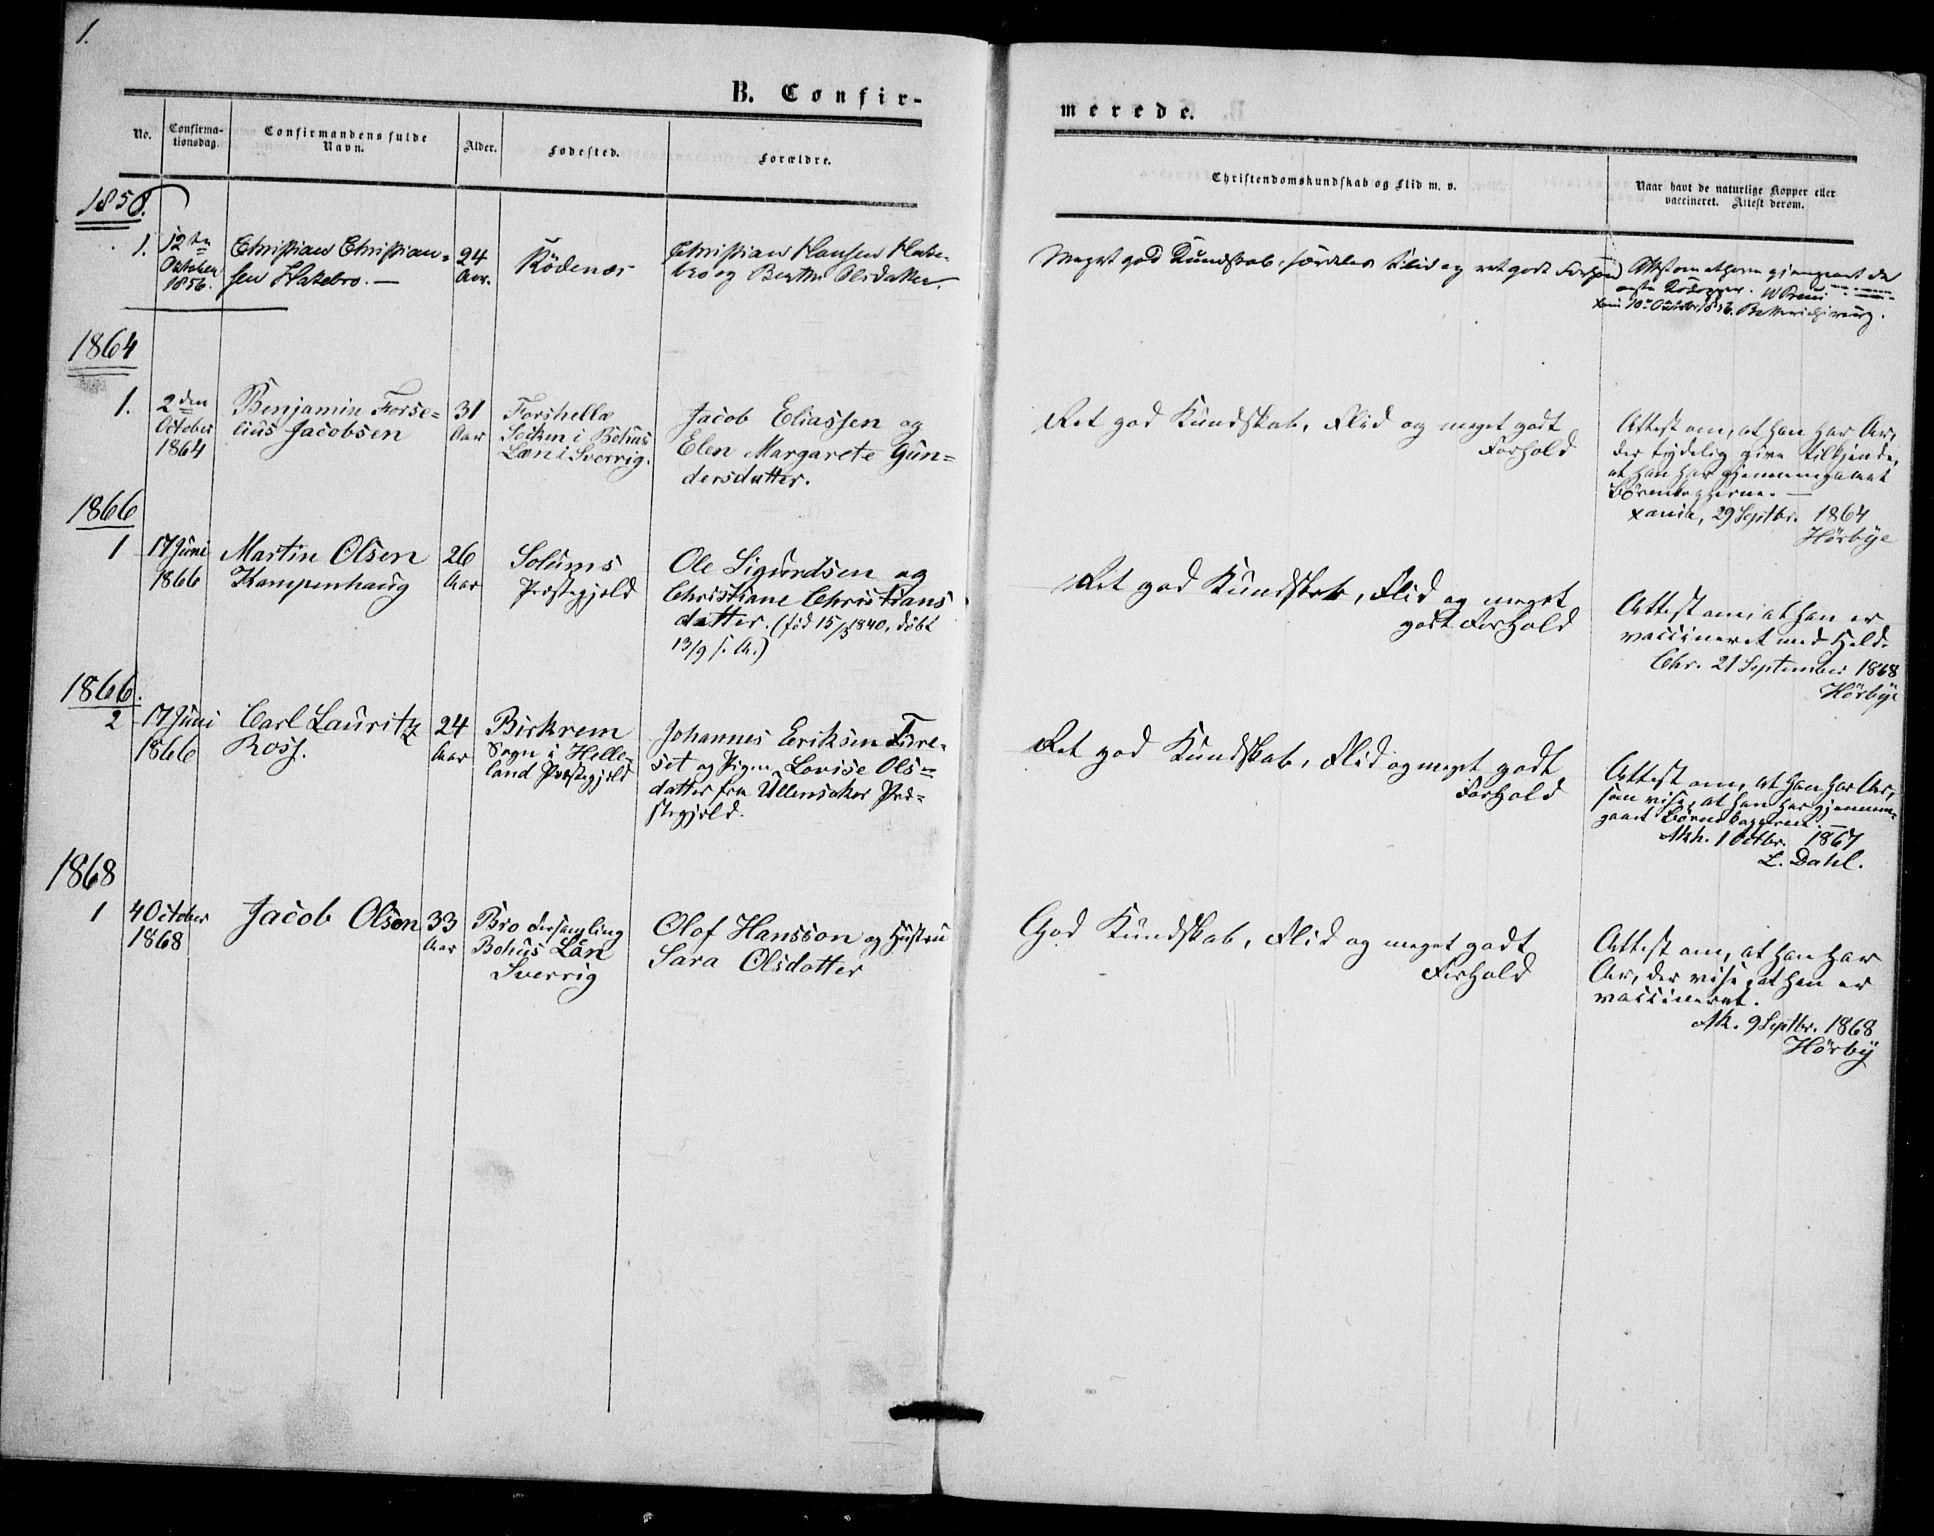 SAO, Akershus festnings slaveri Kirkebøker, F/Fa/L0002: Ministerialbok nr. 2, 1852-1883, s. 1